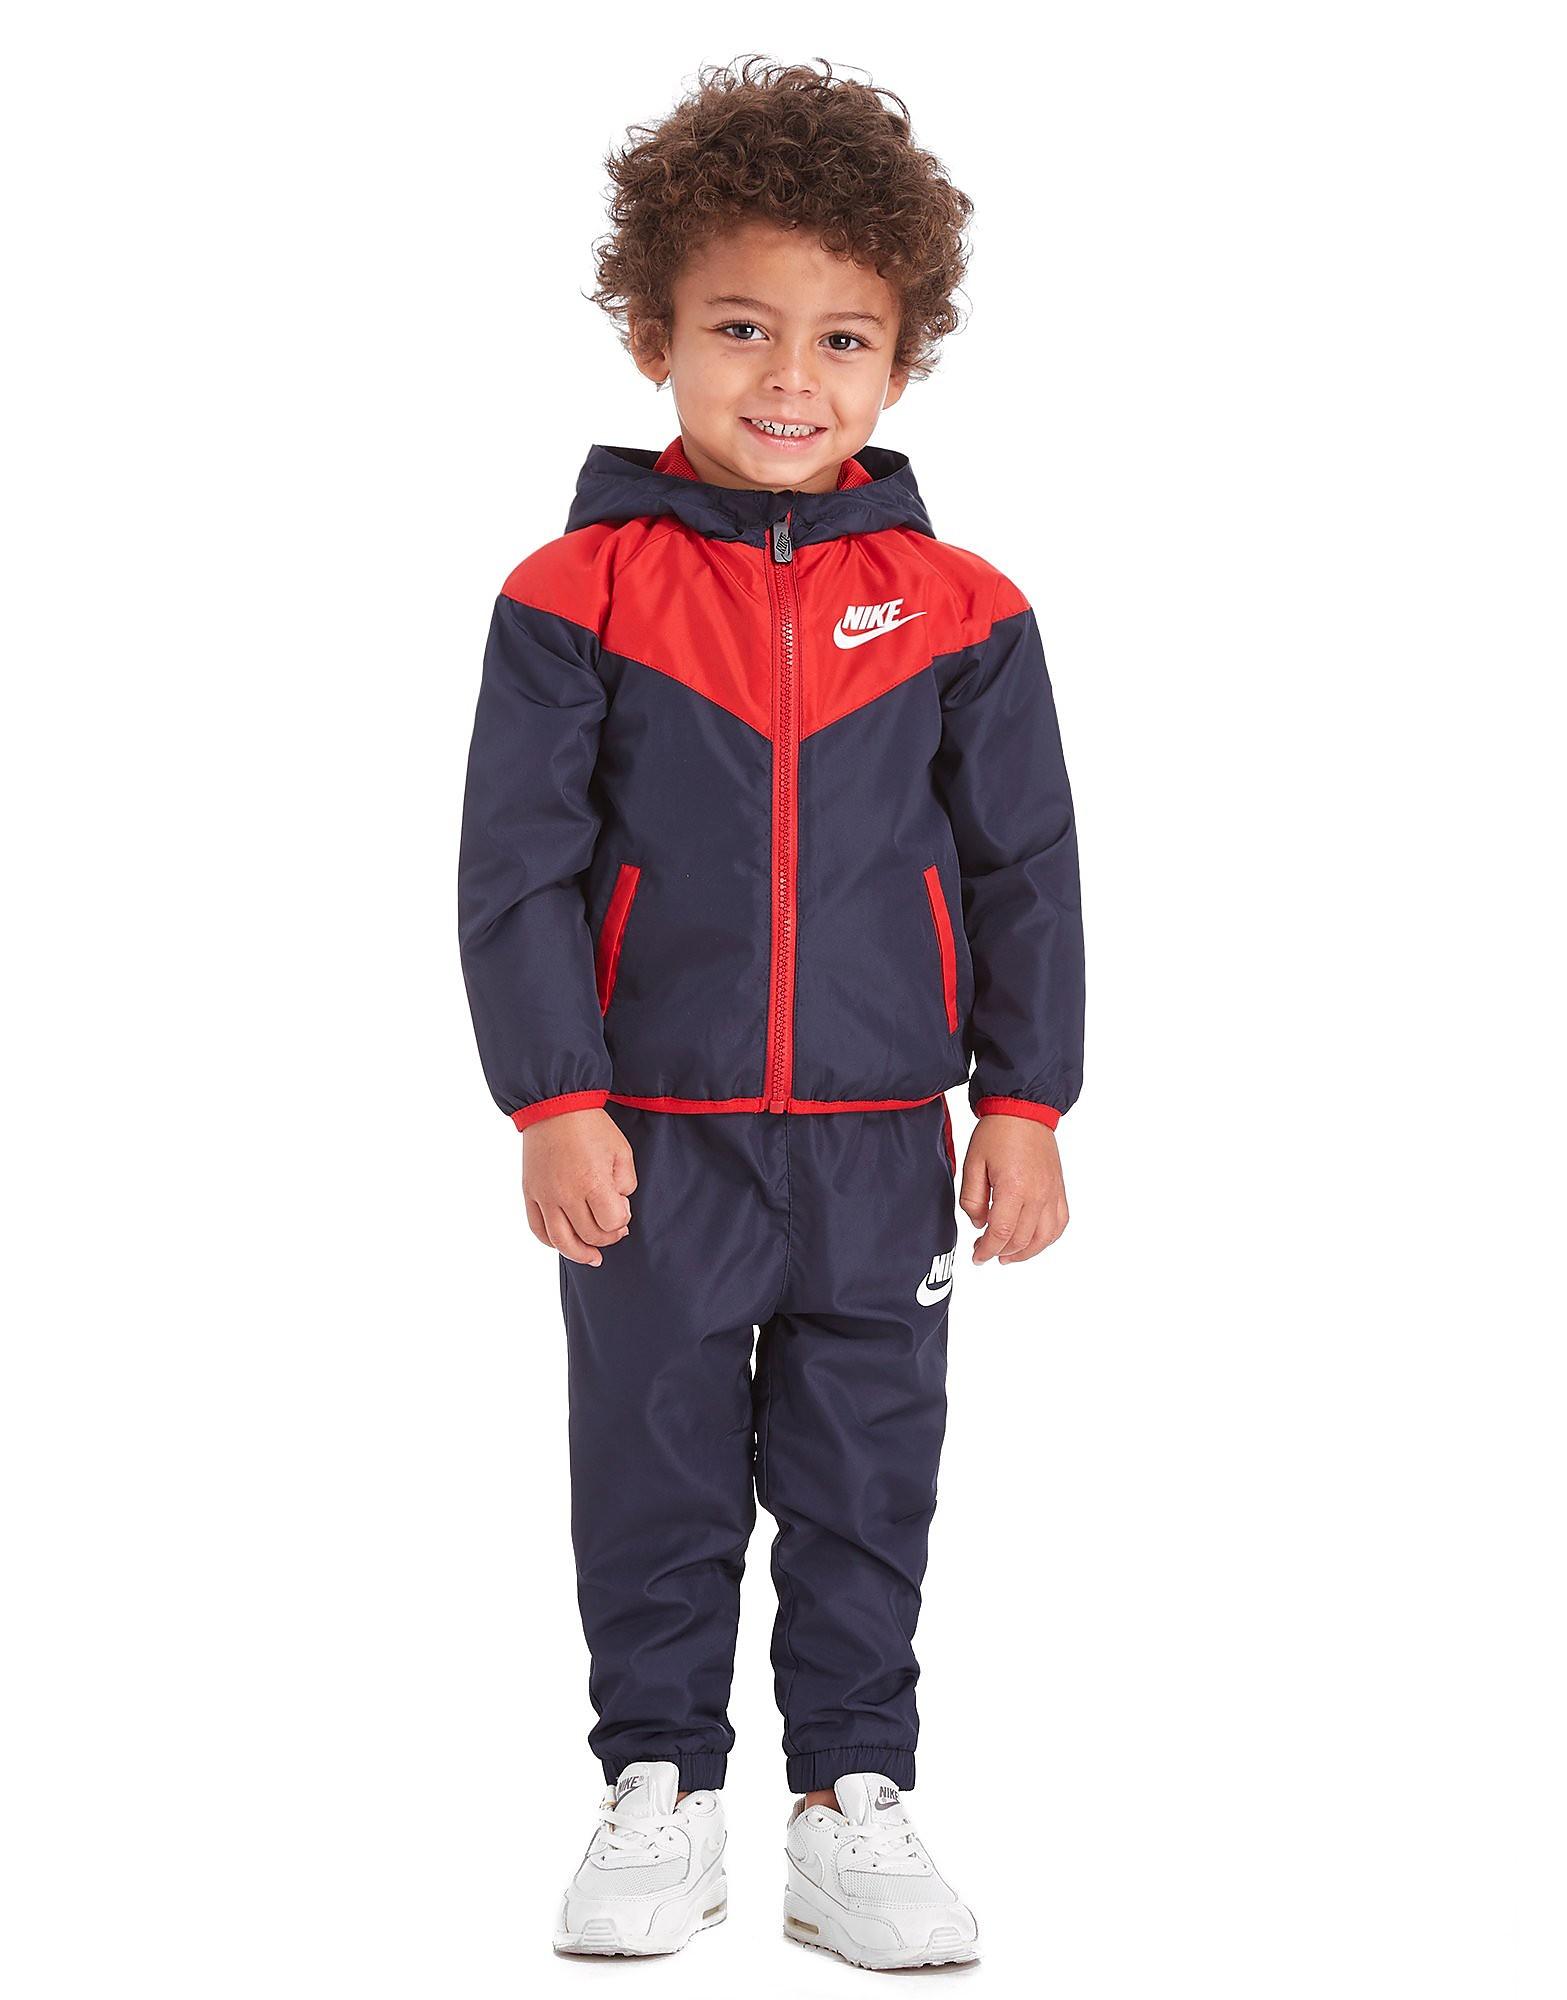 Nike Futura Tracksuit Infant